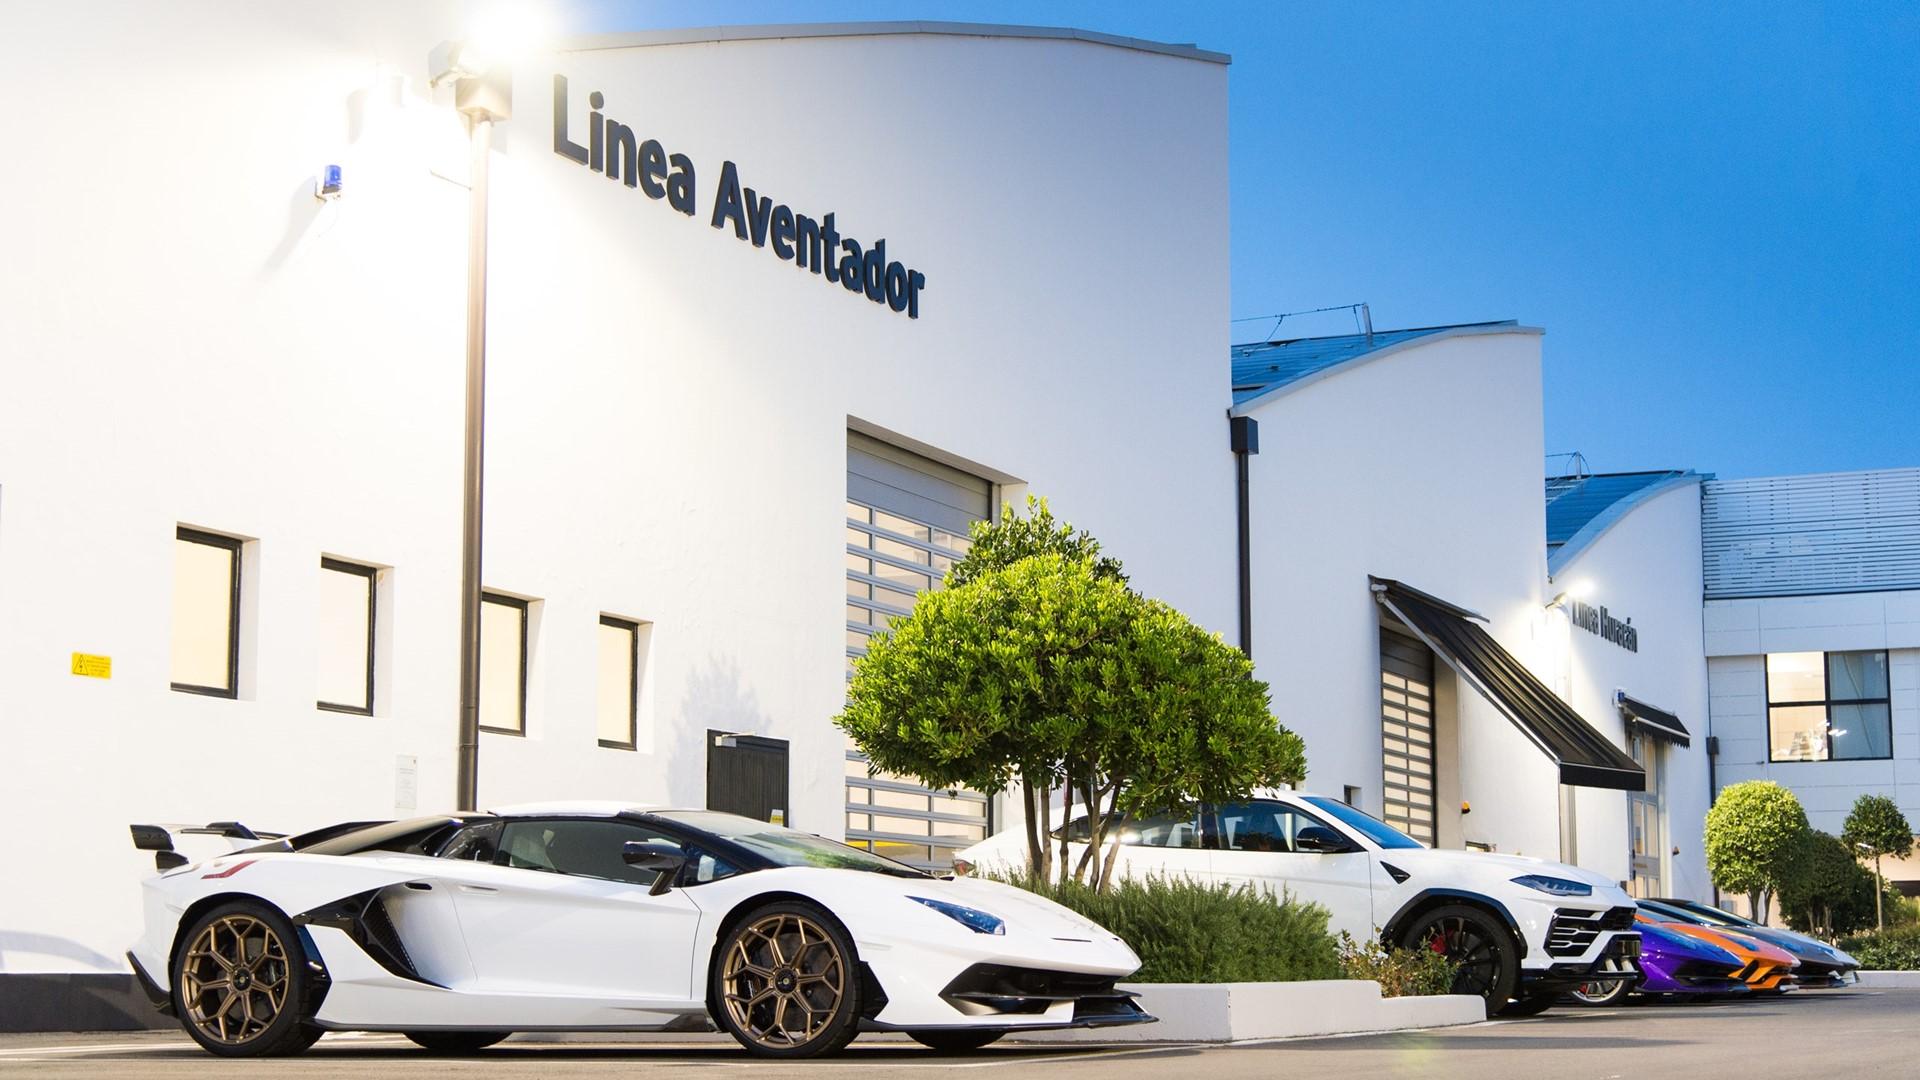 Lamborghini Christmas Drive: a holiday journey with Aventador SVJ, Huracán EVO and Urus celebrates a successful 2019 - Image 2